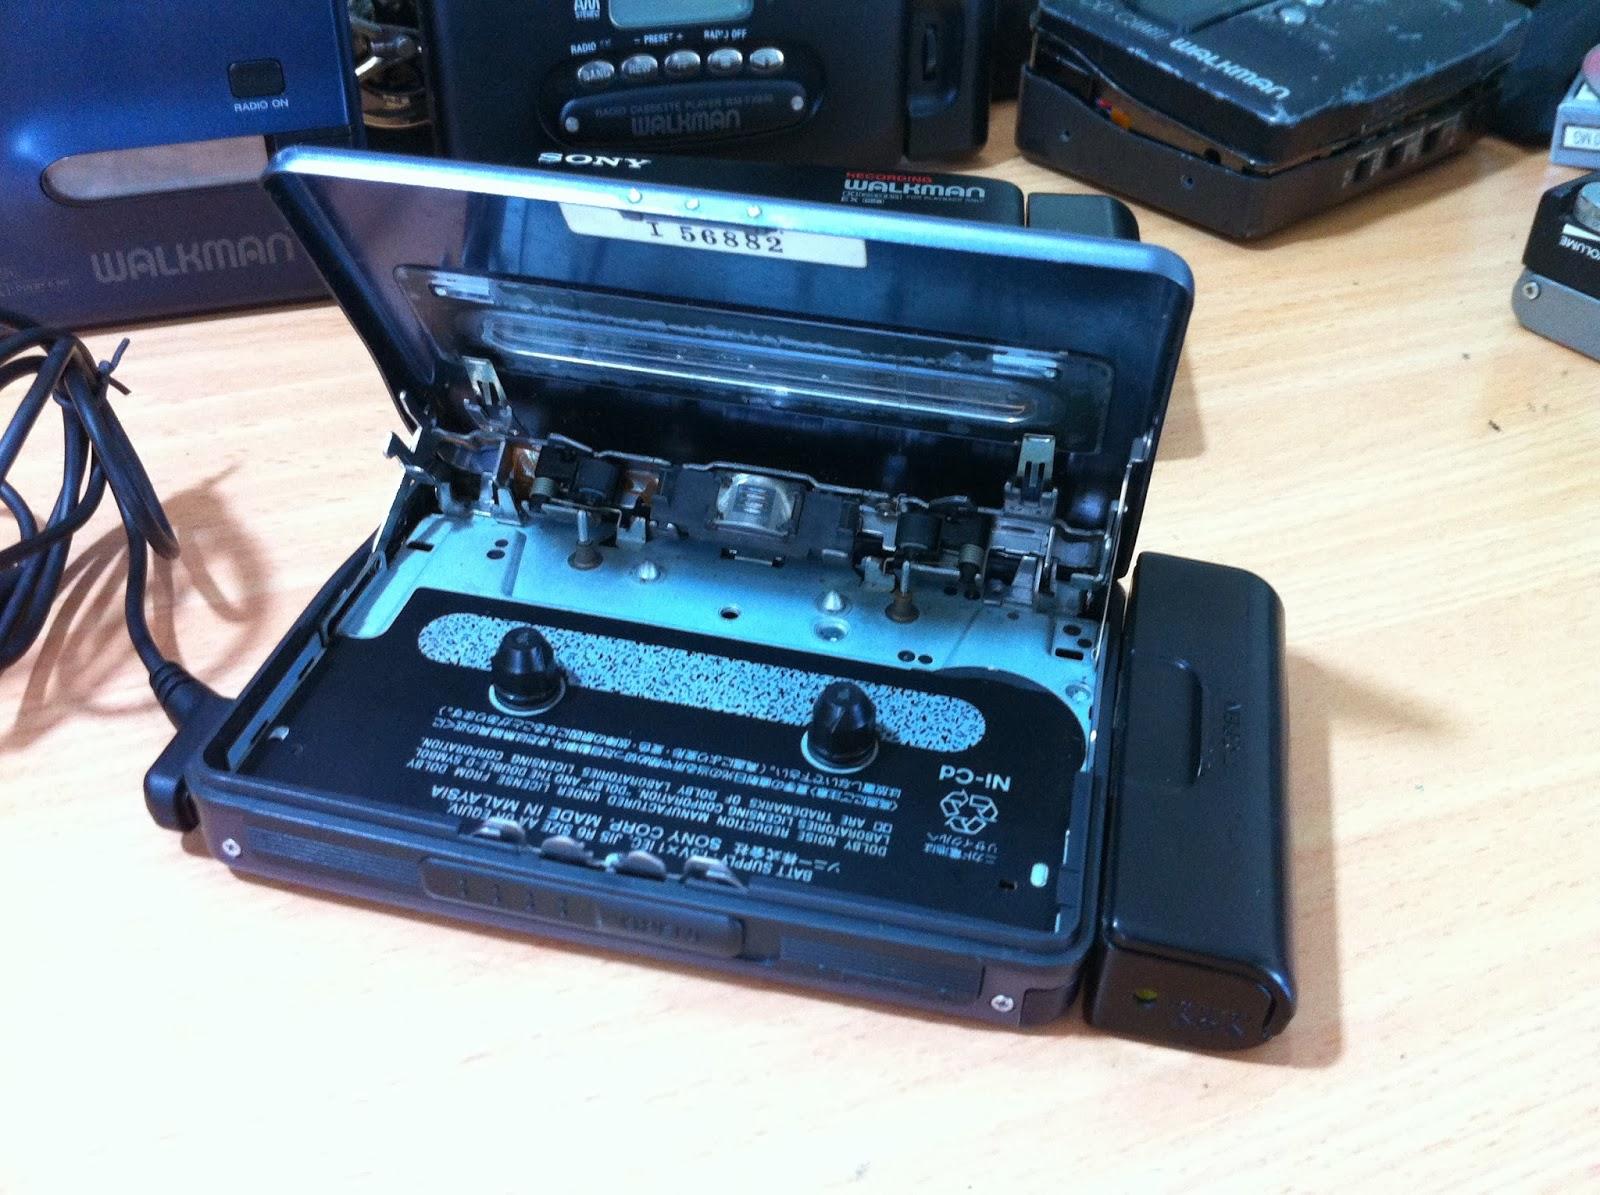 sony wm ex 600 walkman blue portable cassette player vintage audio. Black Bedroom Furniture Sets. Home Design Ideas